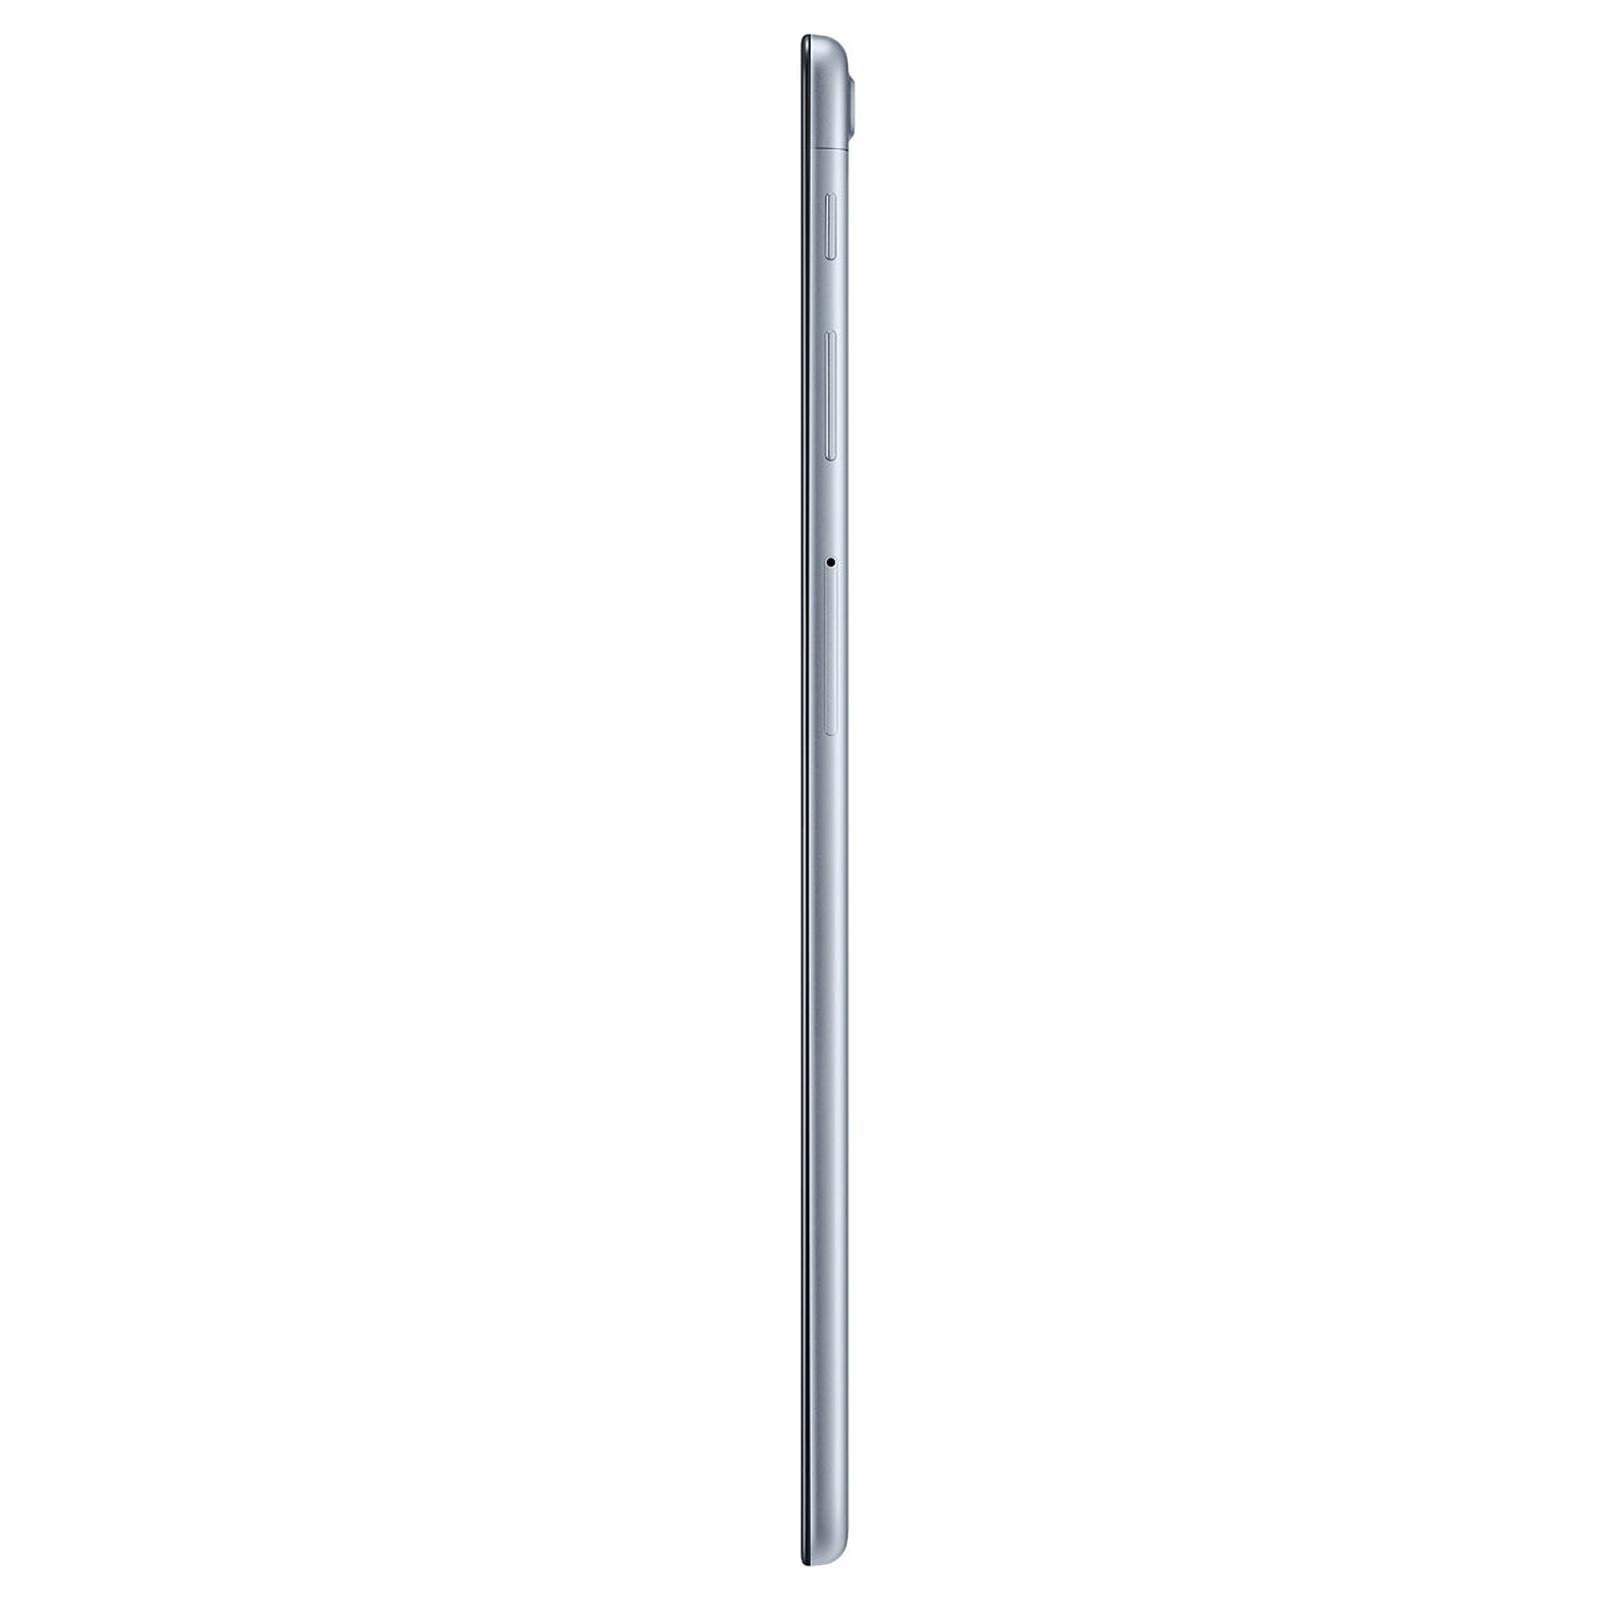 "Galaxy TAB A (2019) T510NZK Silver - 32Go/10.1"" (SM-T510NZSDXEF) - Achat / Vente Tablette tactile sur Picata.fr - 2"